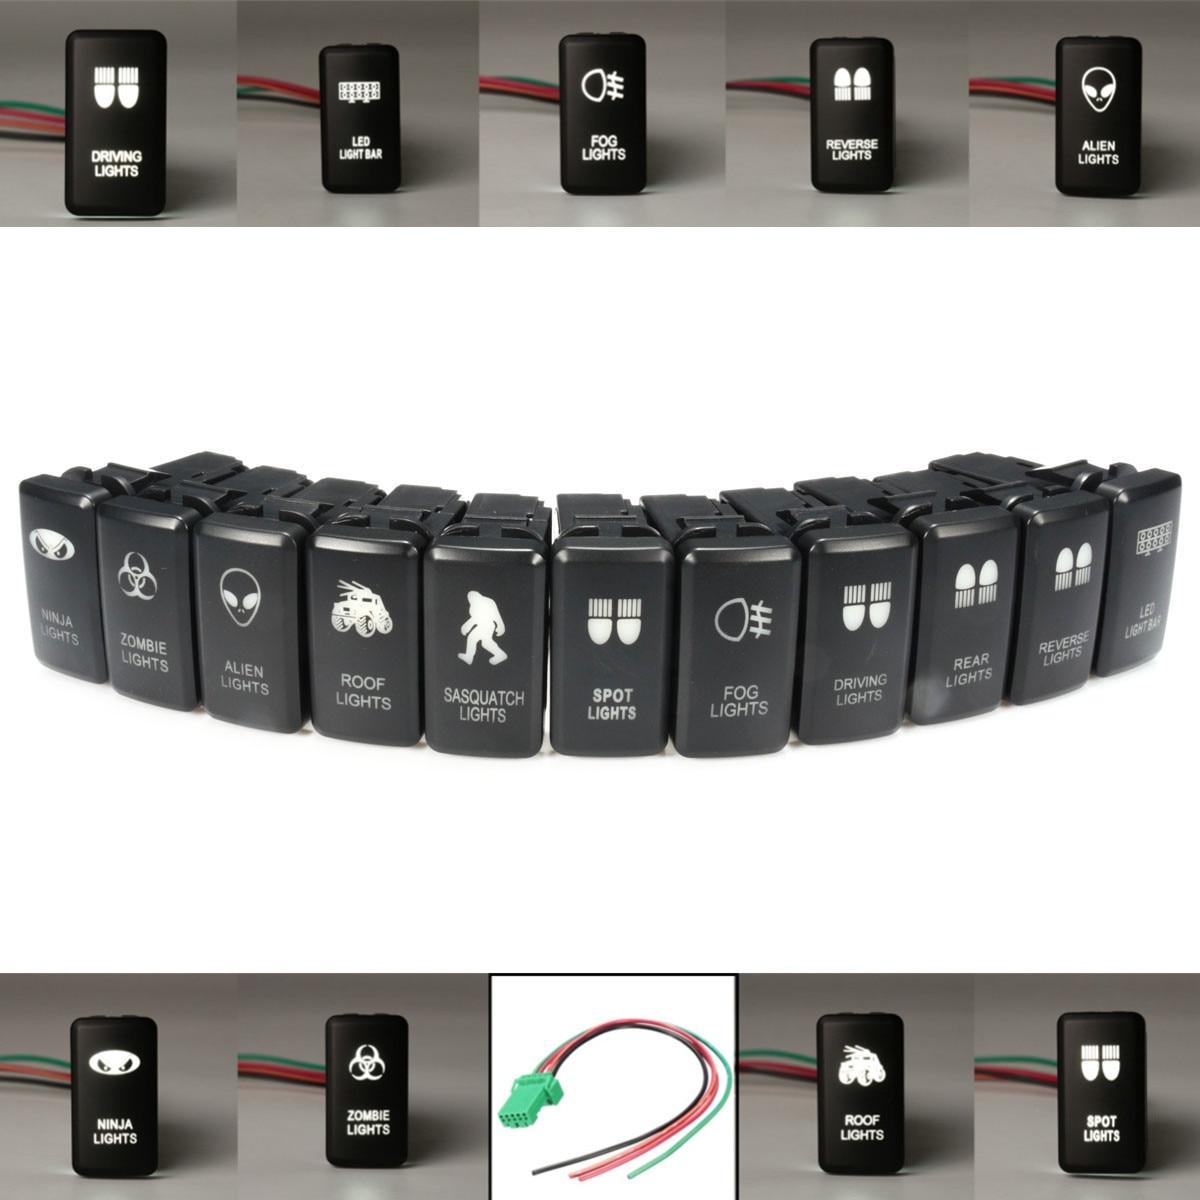 1x Dual White ON/OFF LED Light Bar Push Switch For Toyota Landcruiser Hilux Prado 120 /FJ CRUISE Honda Grom